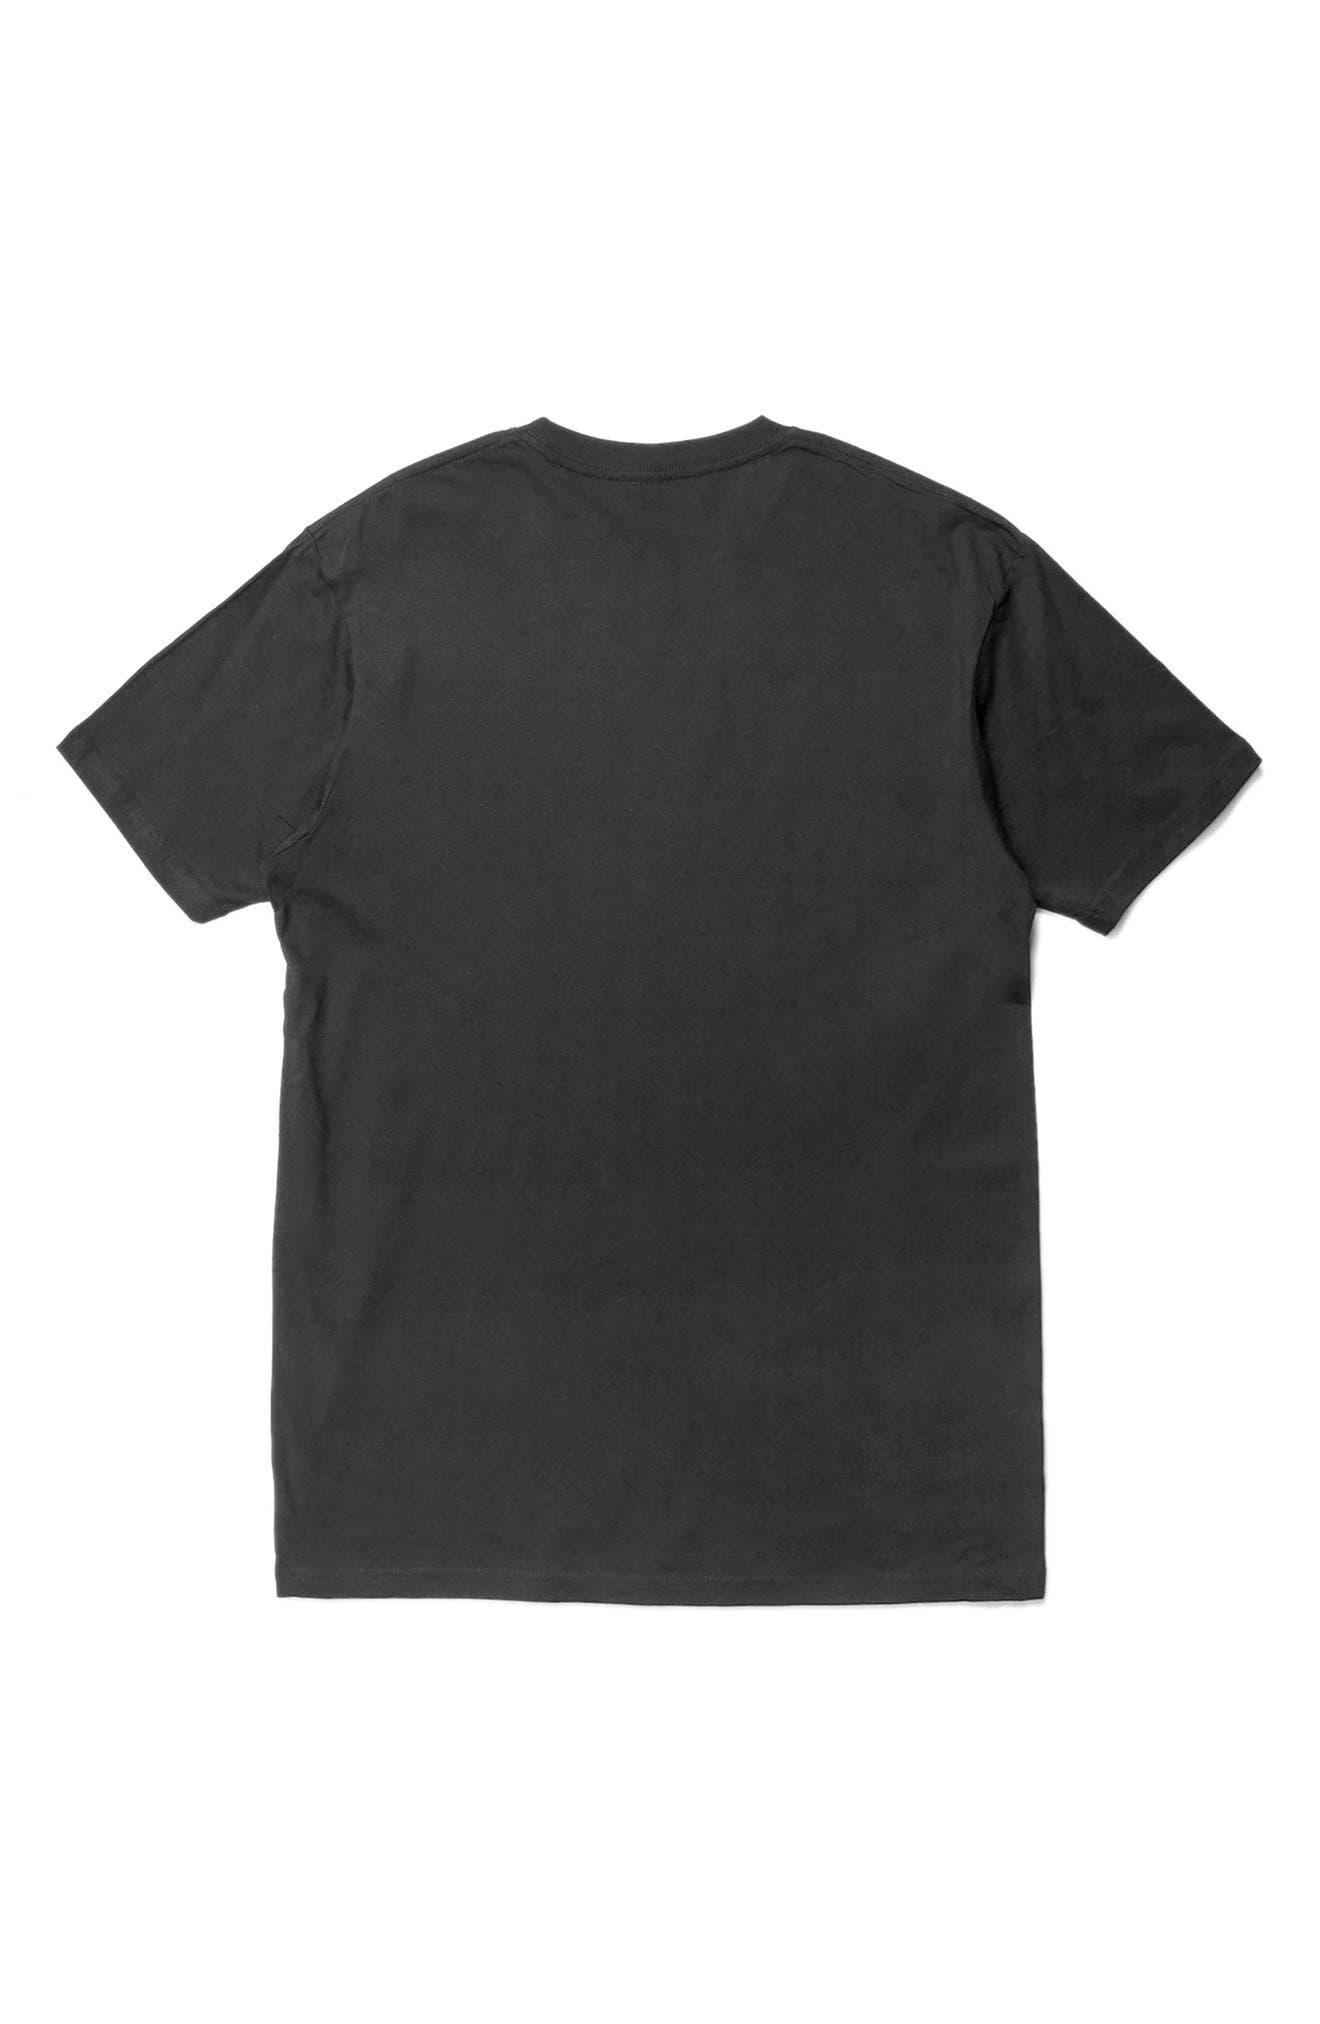 Positive Future Graphic T-Shirt,                             Alternate thumbnail 2, color,                             001